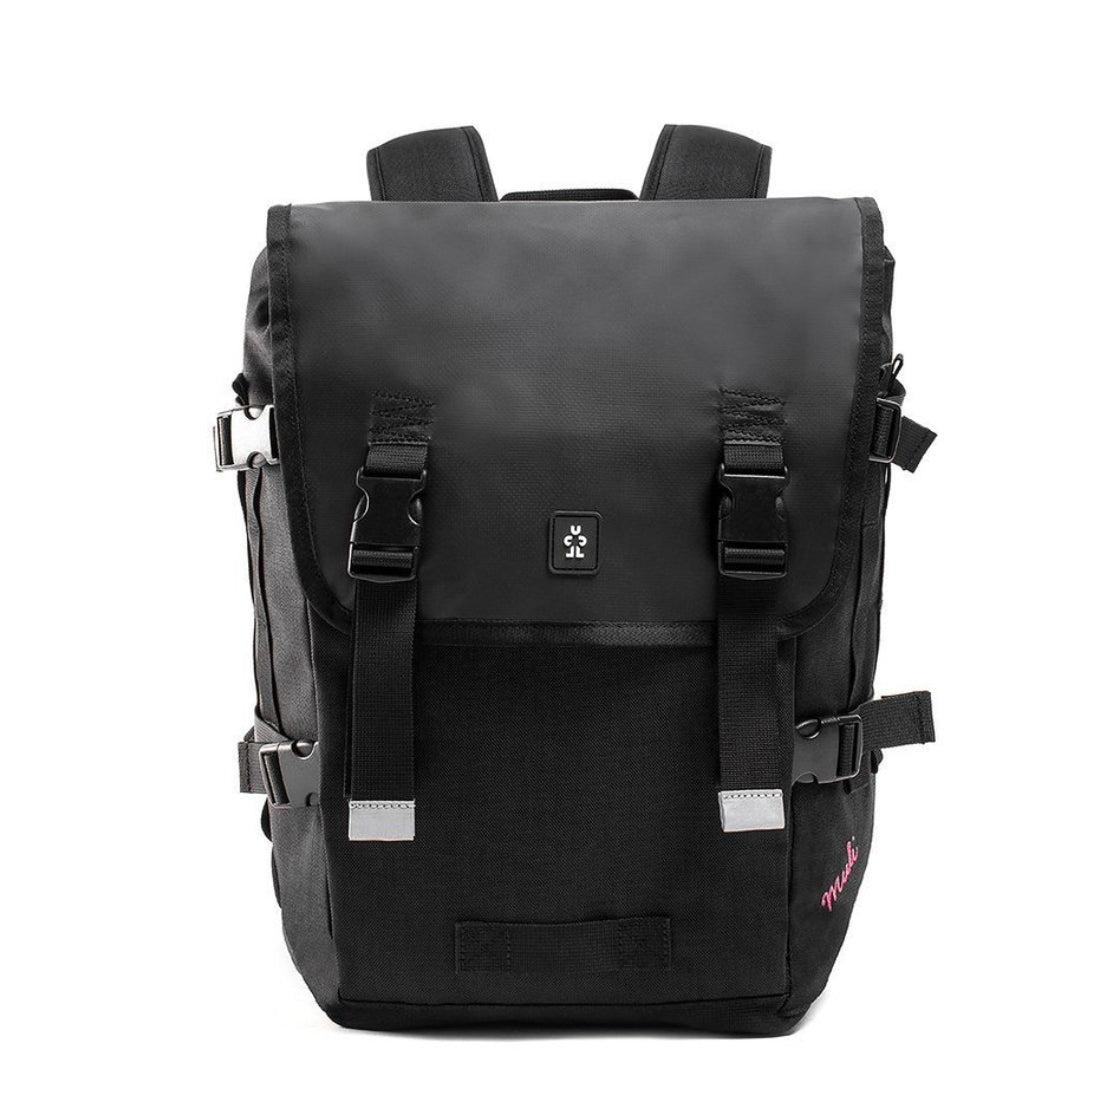 Crumpler Muli L Day Backpack black / black 18 L